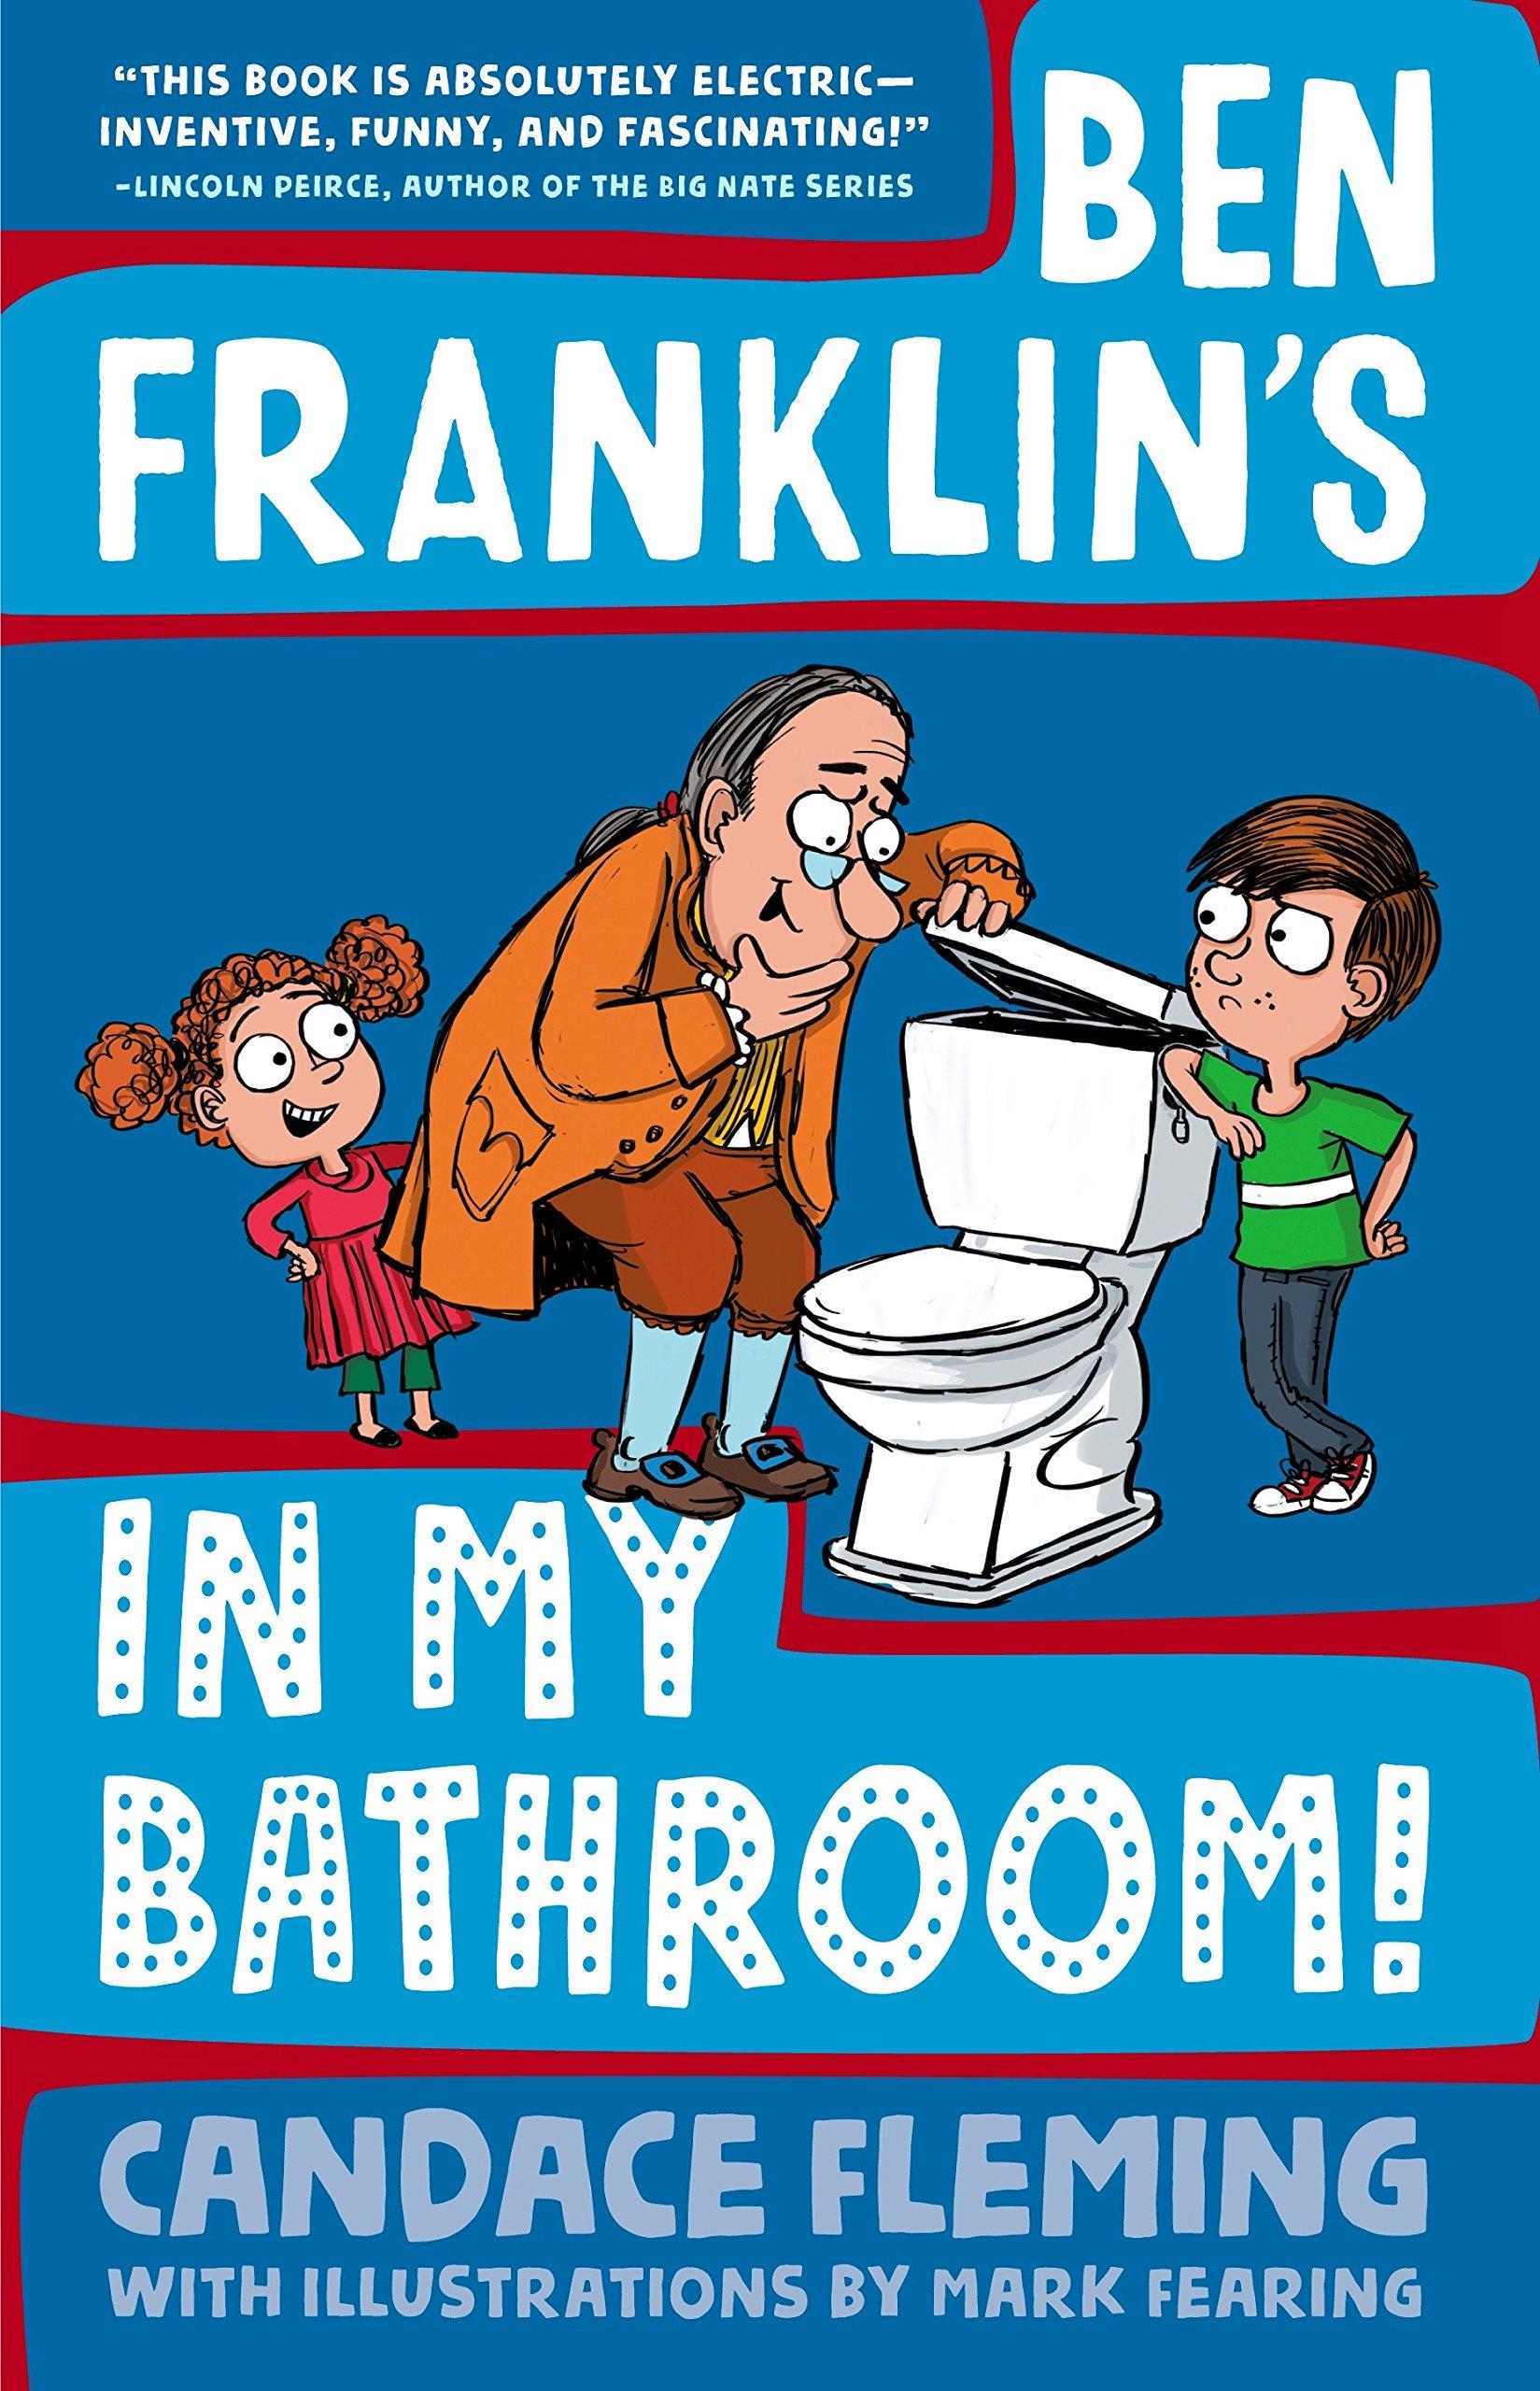 Ben Franklins Bathroom History Pals product image